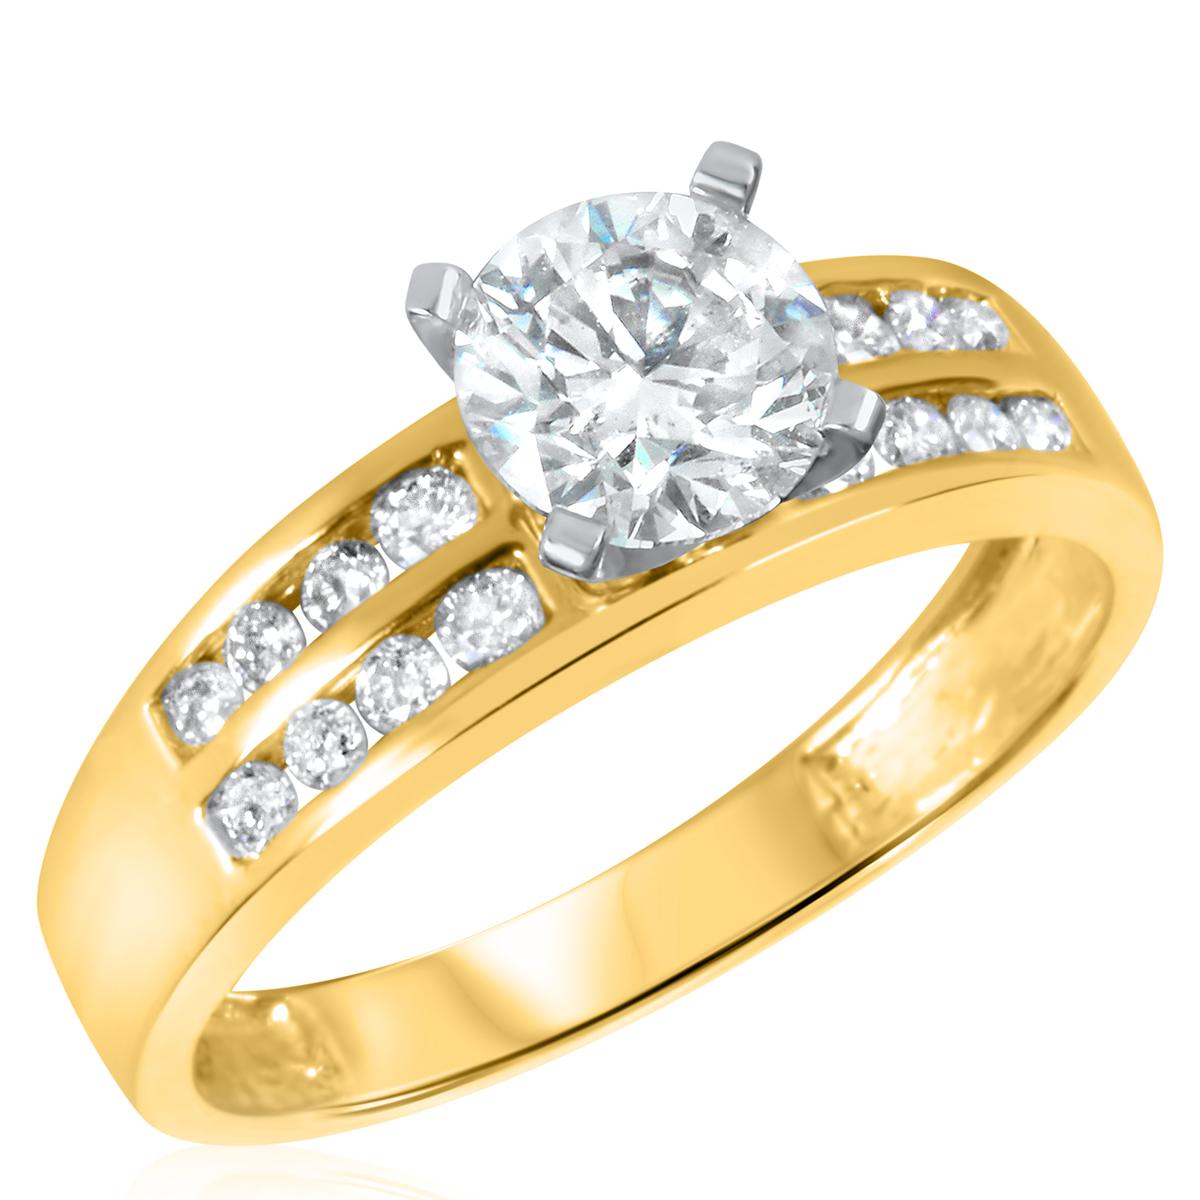 1 1/3 CT. T.W. Diamond Ladies Engagement Ring 10K Yellow Gold- Size 8